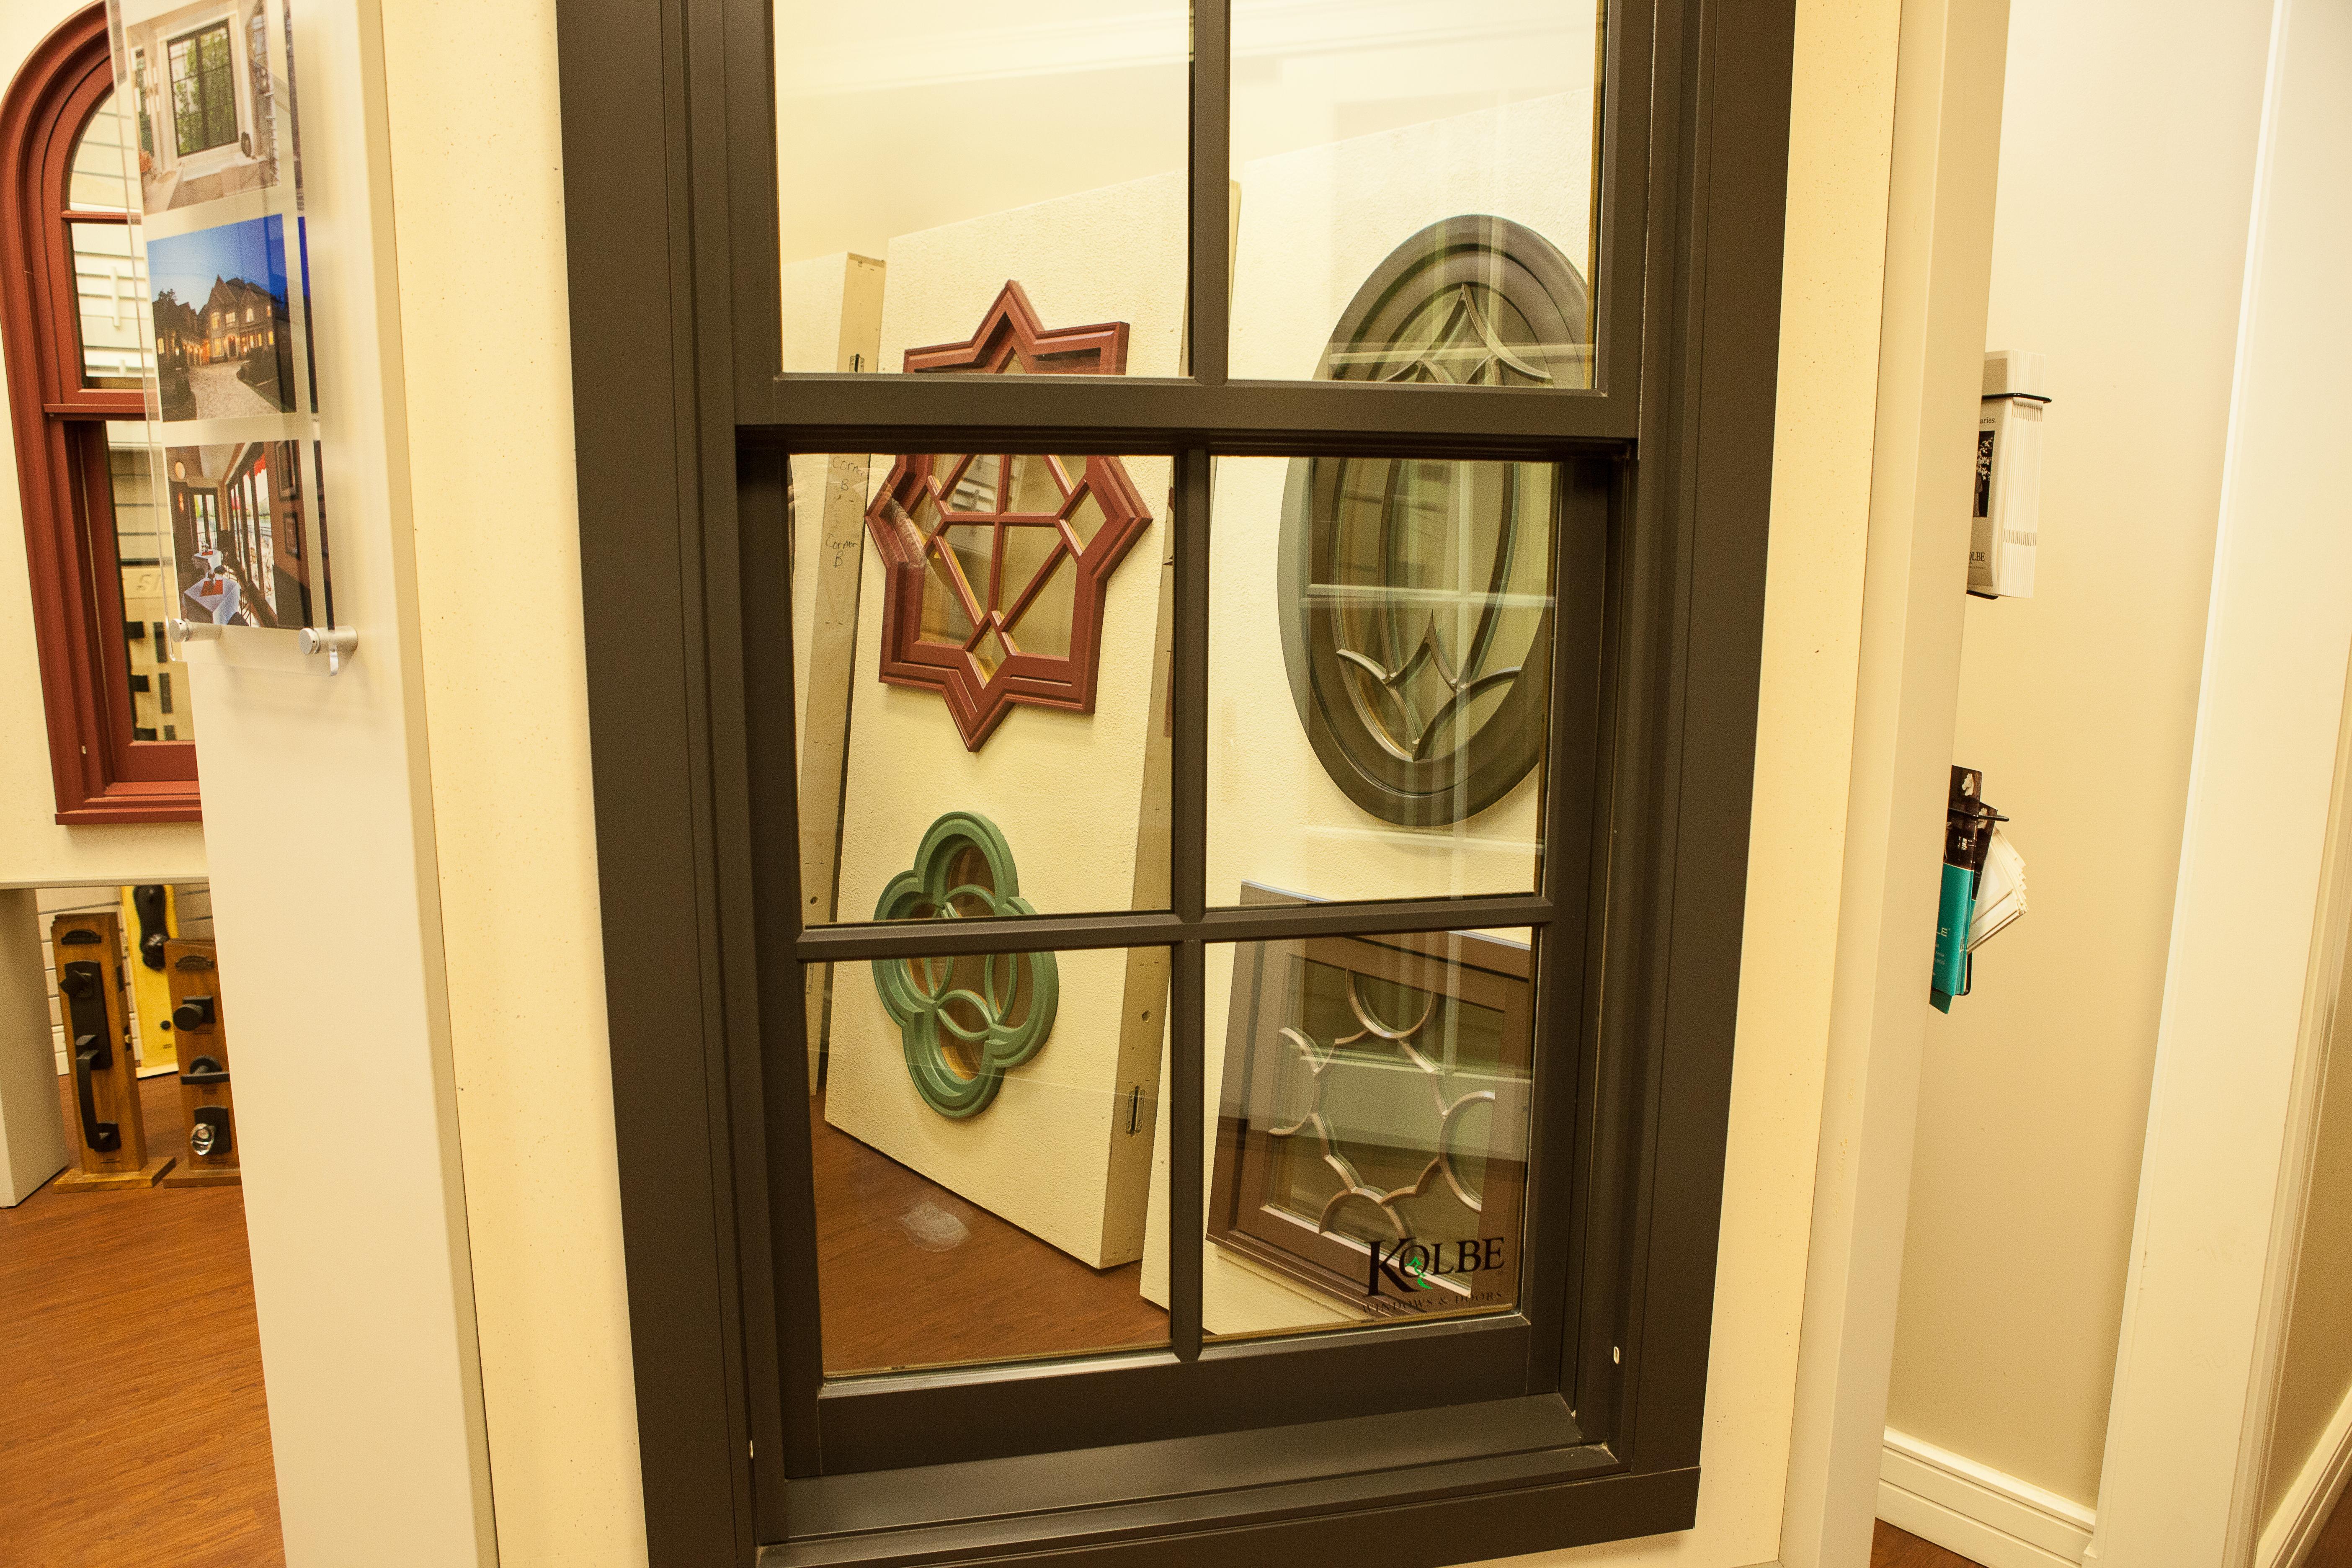 Kolbe Windows Doors Remmertcompany